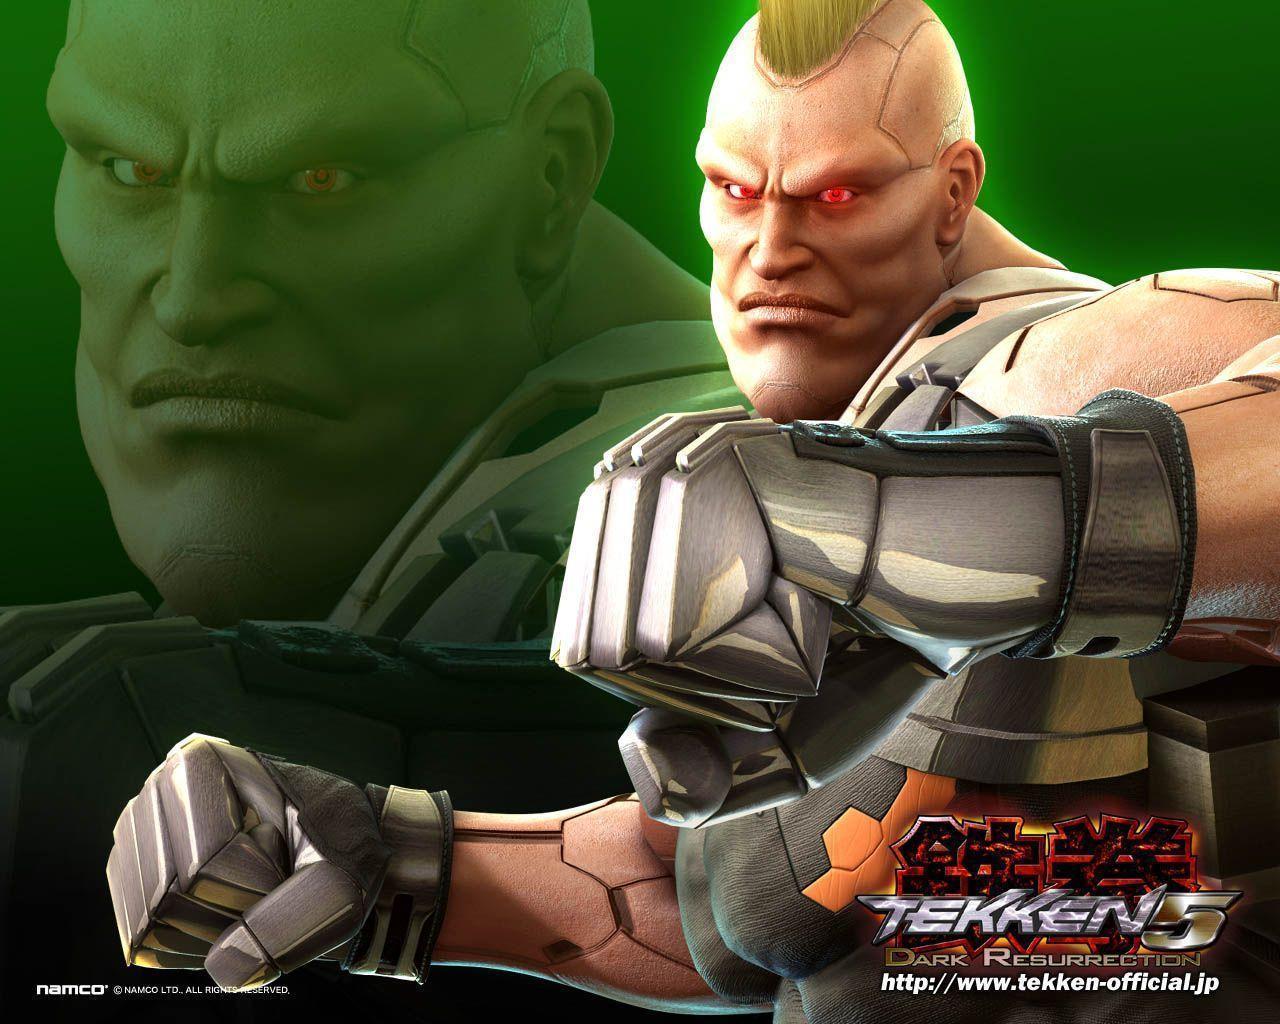 Dark Resurrection Wallpaper - Tekken Wallpaper (243867) - Fanpop